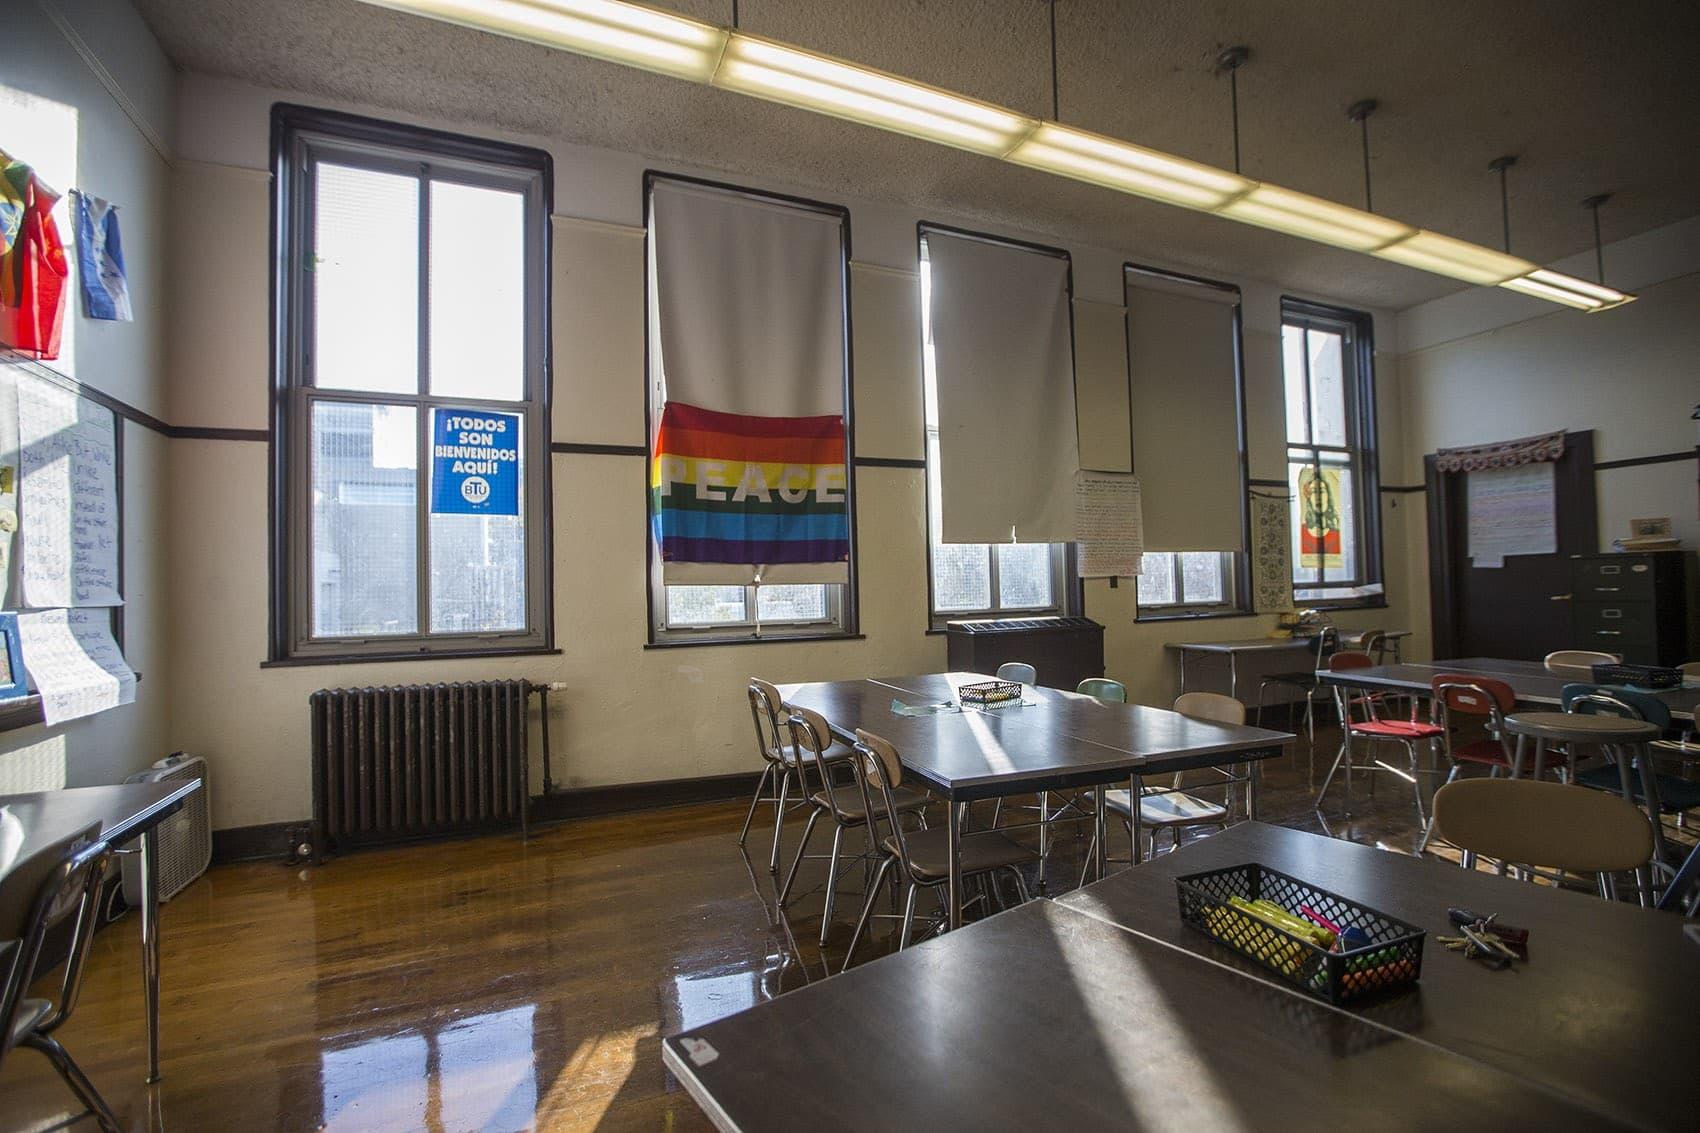 A classroom in Boston. (Jesse Costa/WBUR)